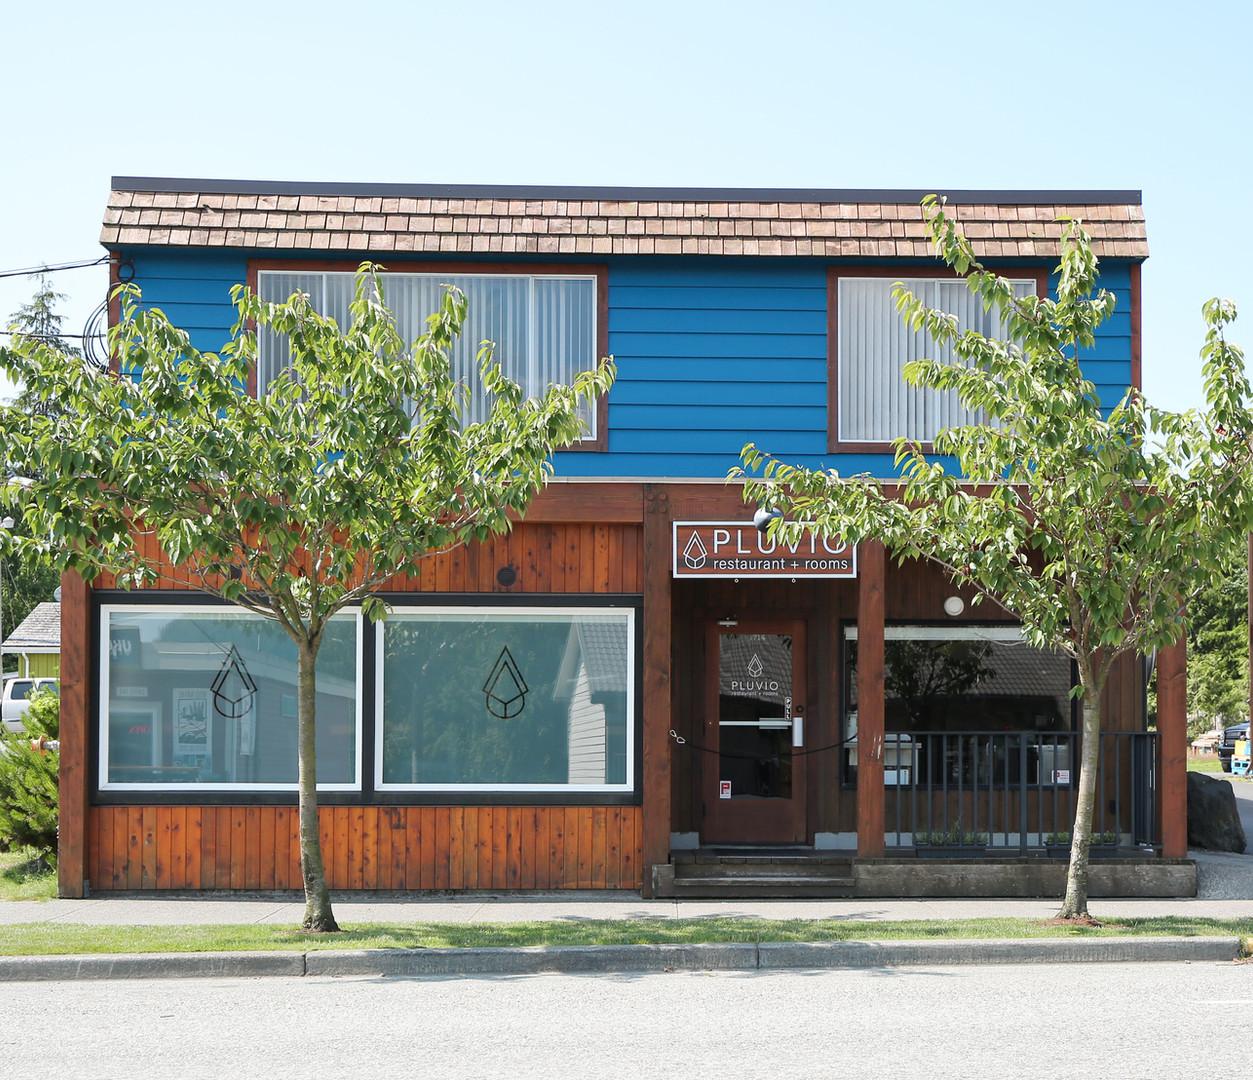 Pluvio restaurant and rooms